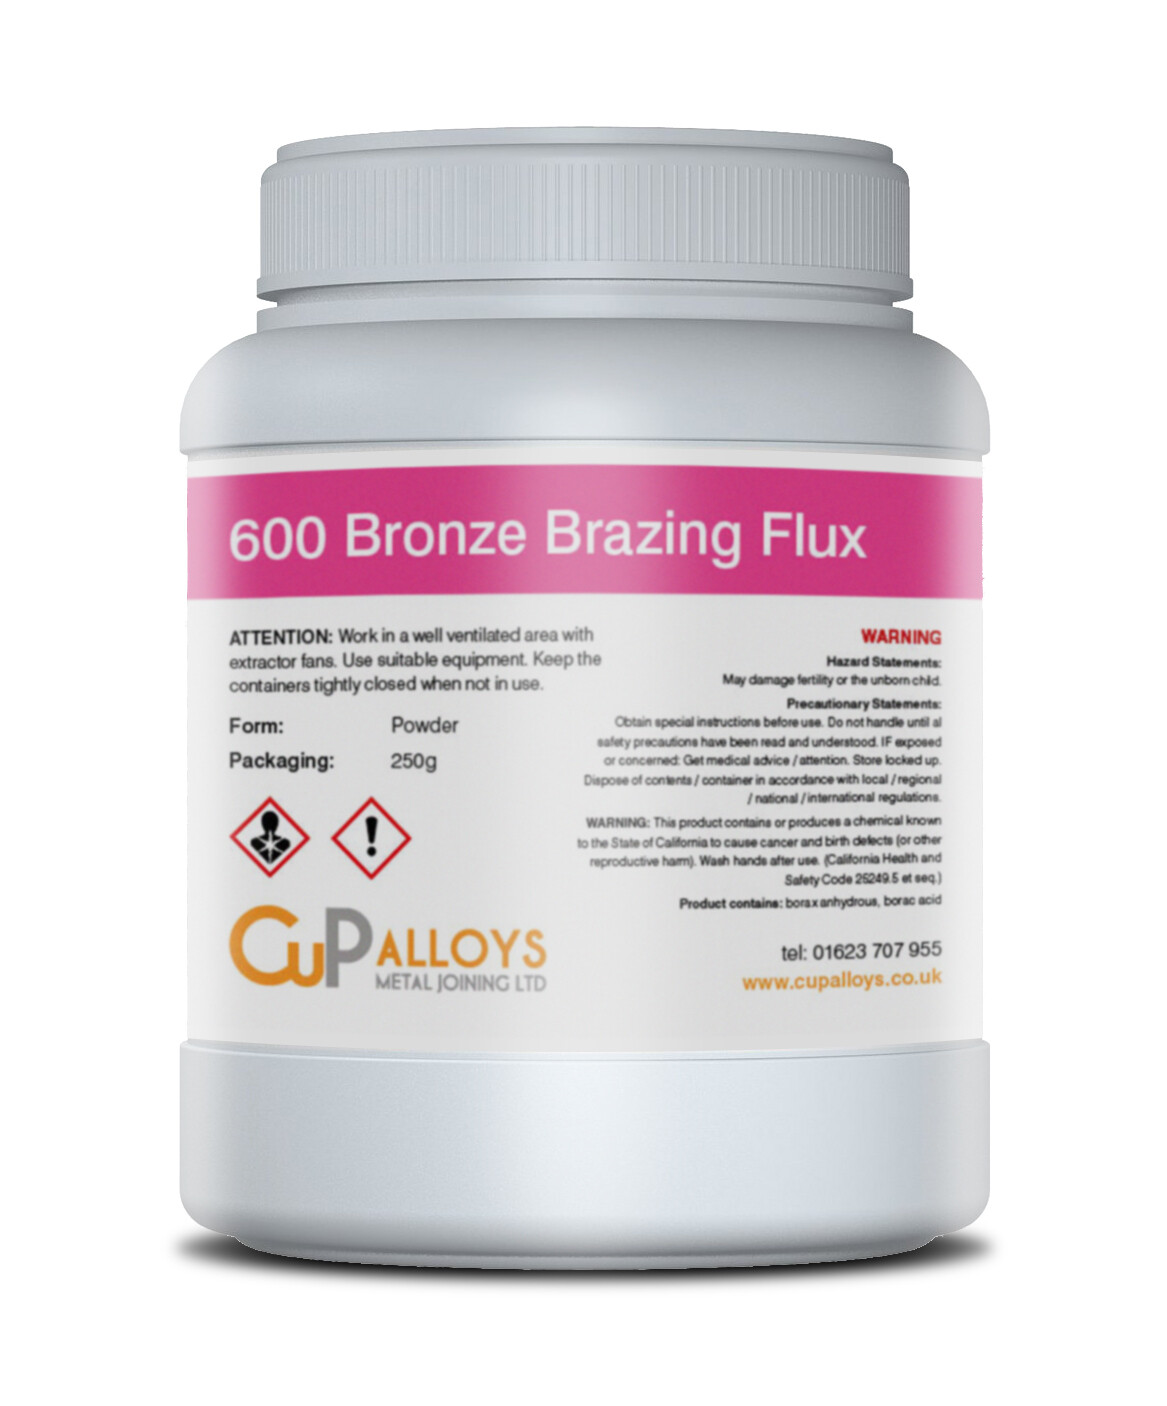 600 Bronze Brazing Flux 250g